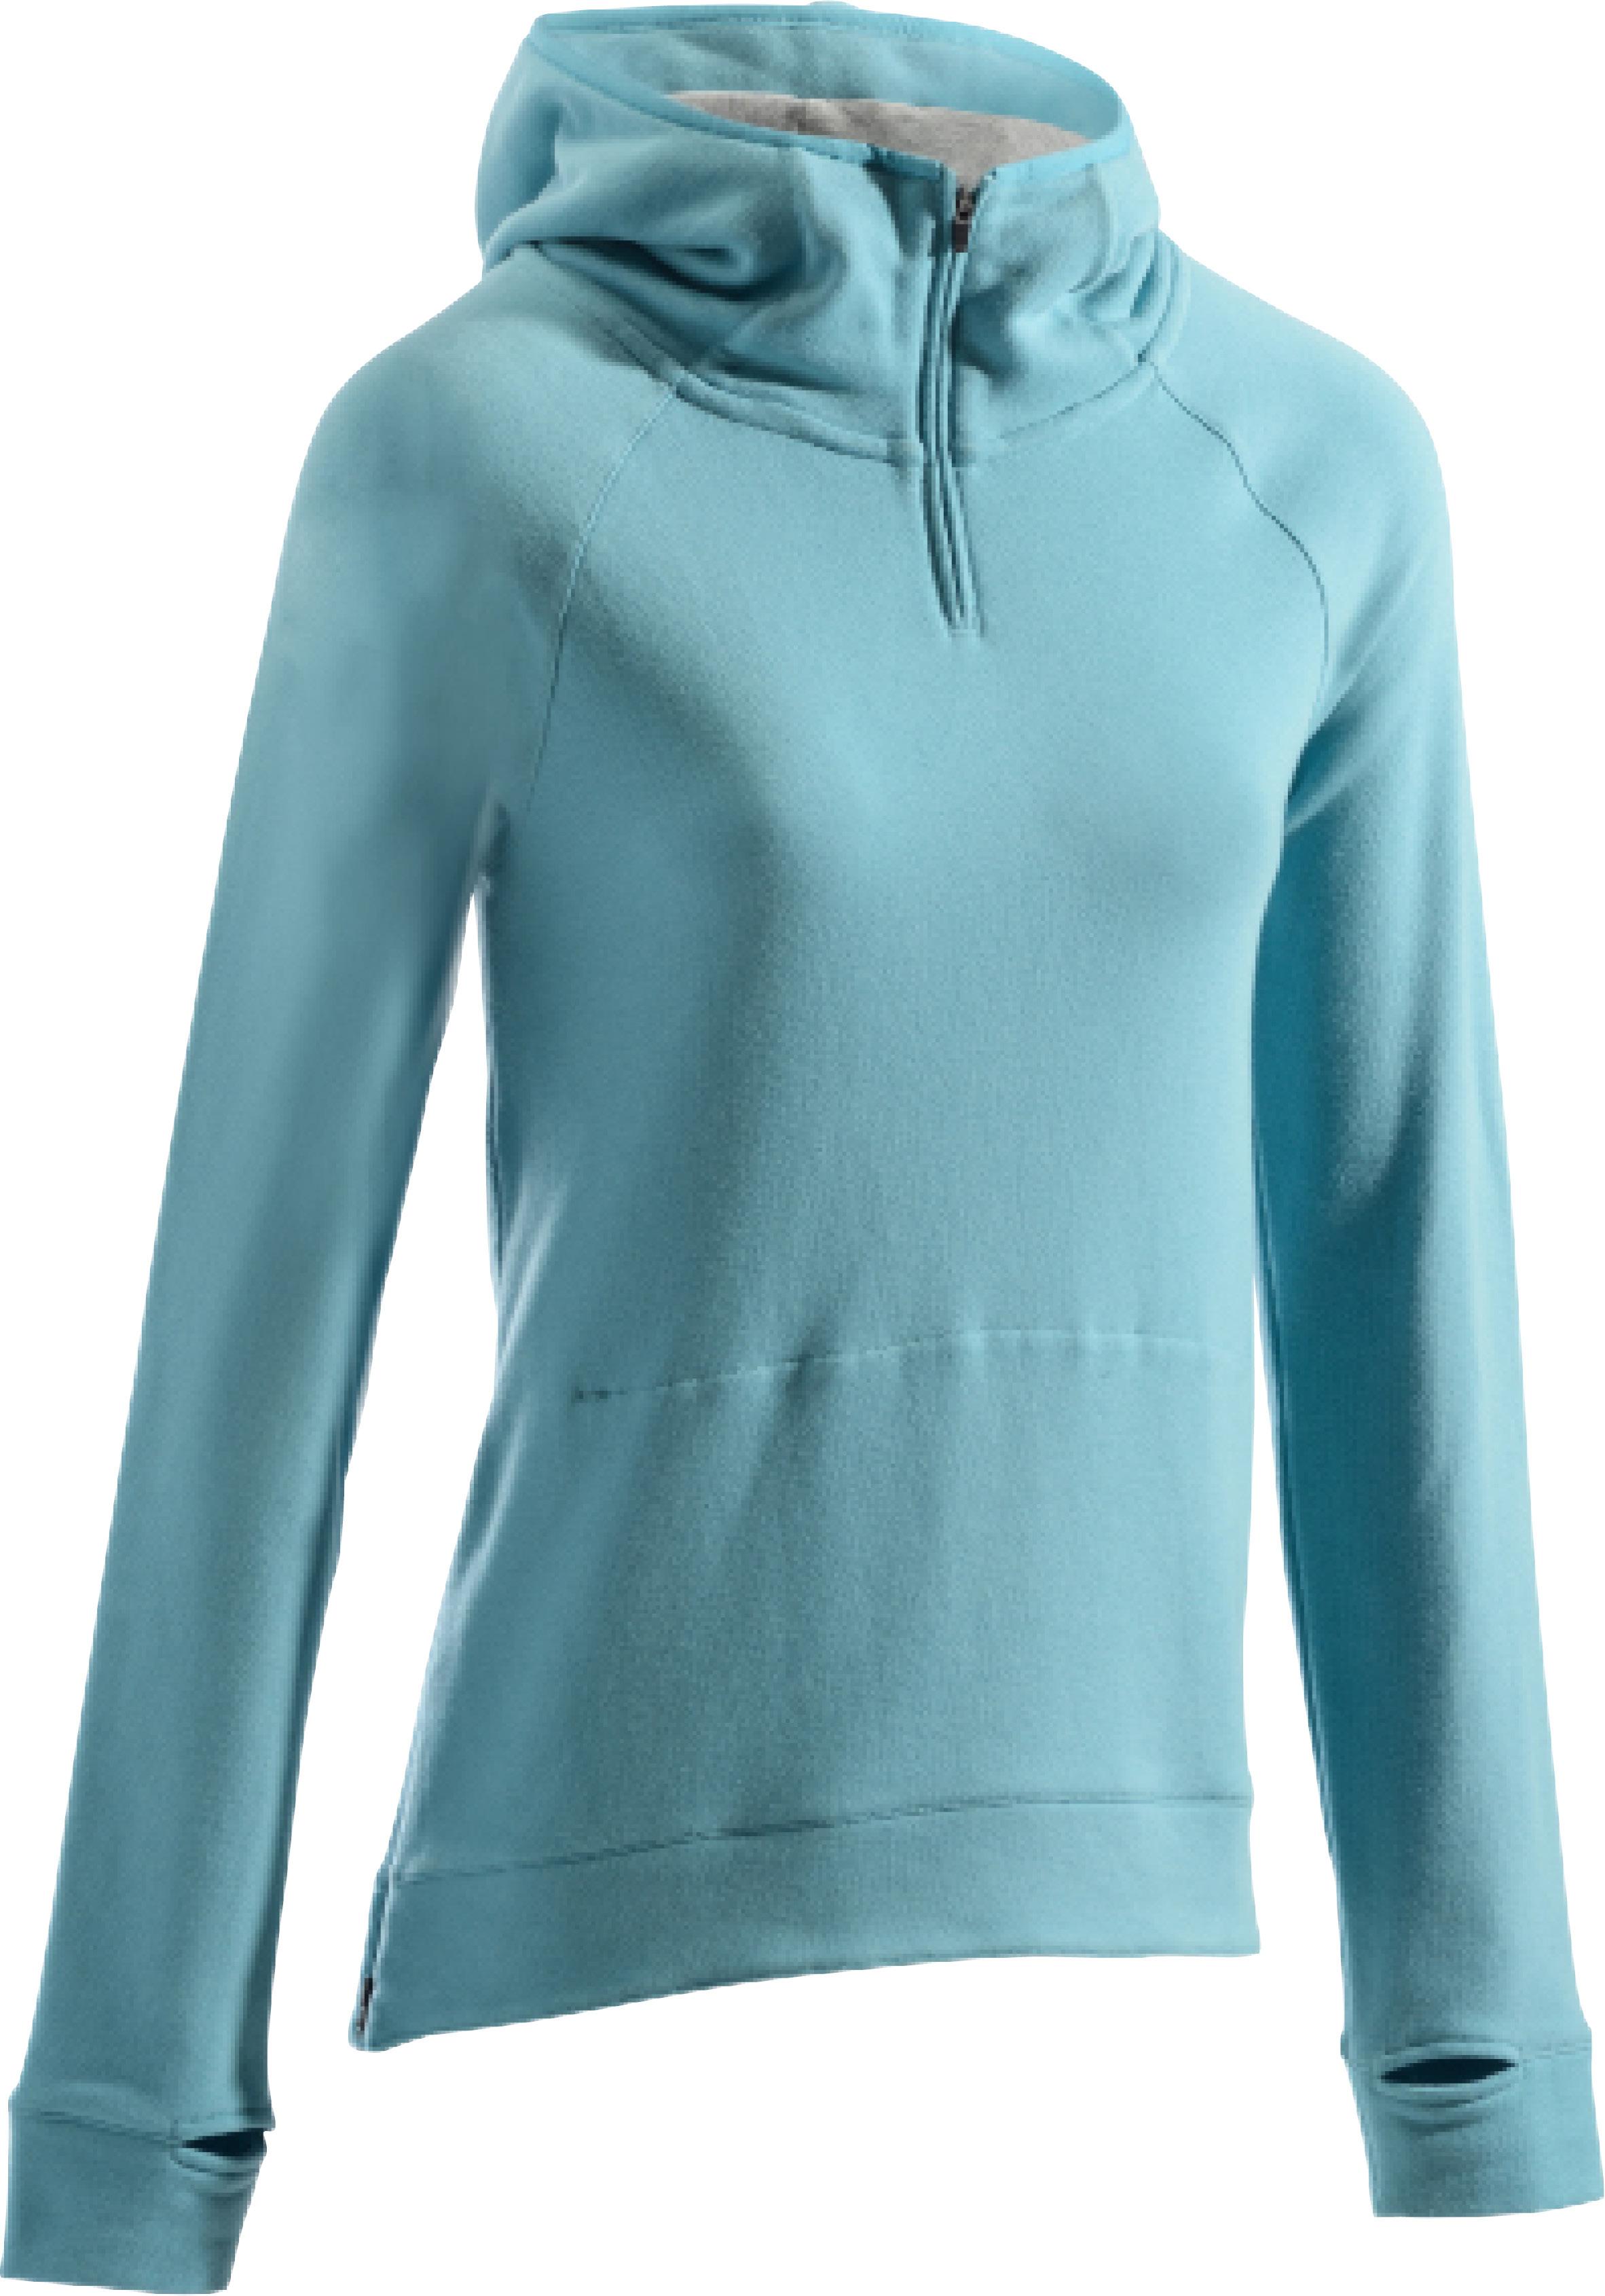 Pilates Capuche Bleu 900 Femme Glacier Sweat Gymamp; Shirt ED2WIH9